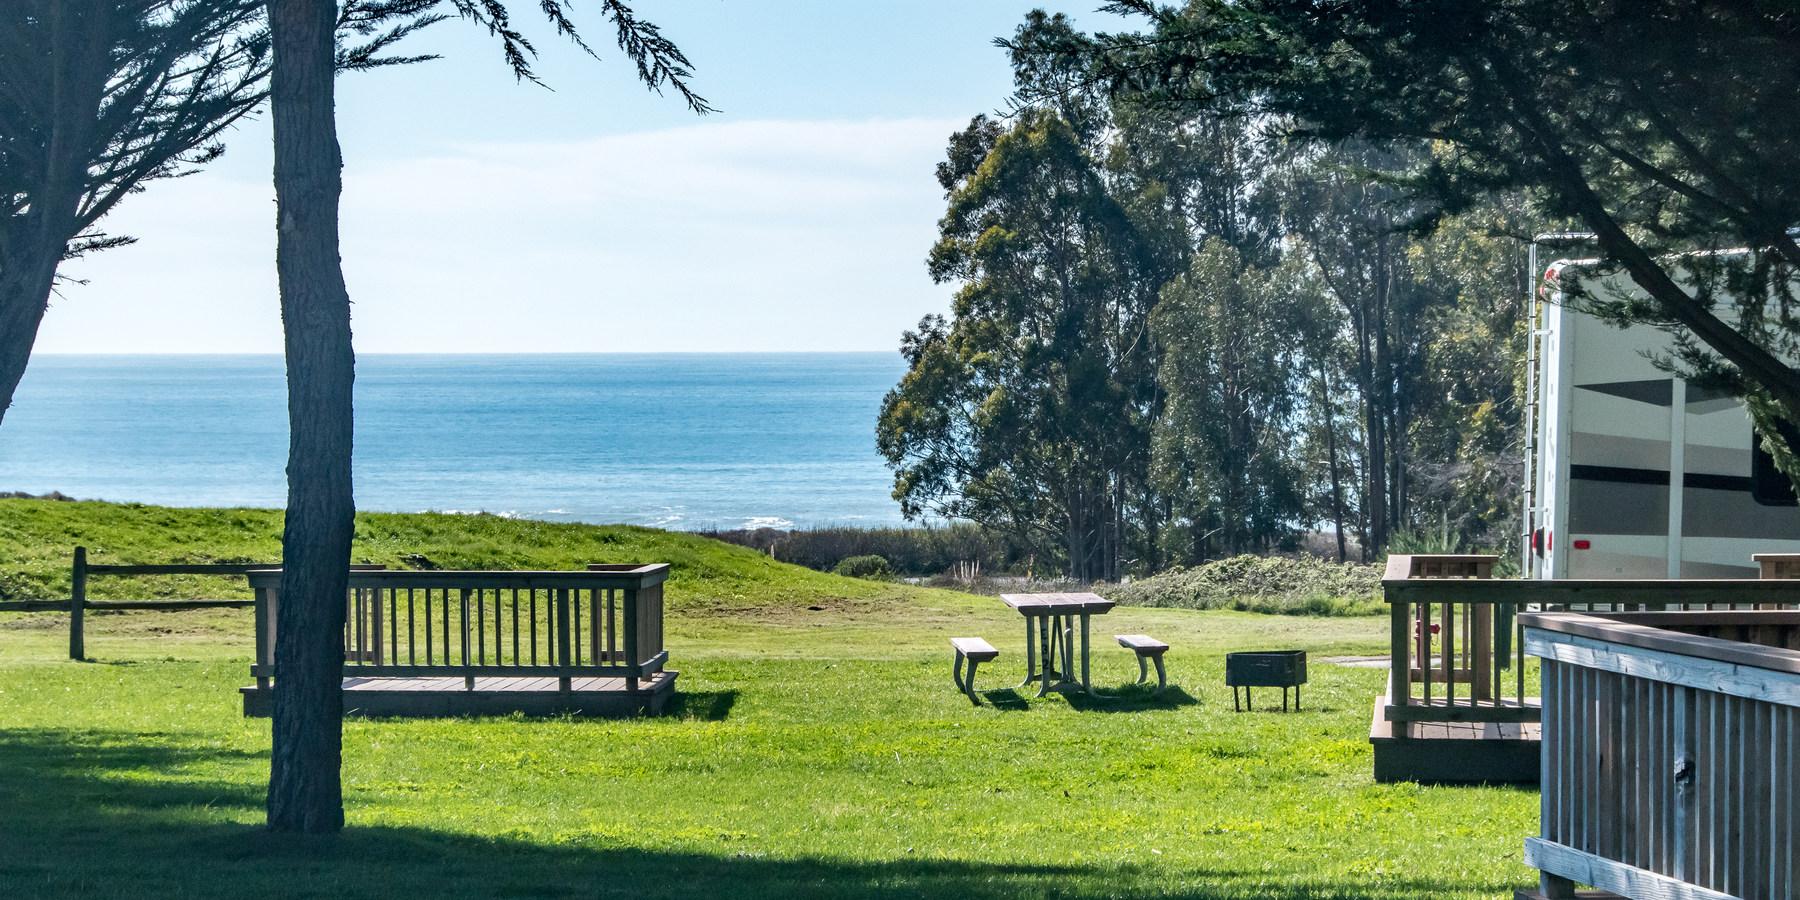 Costanoa Koa Camping In California